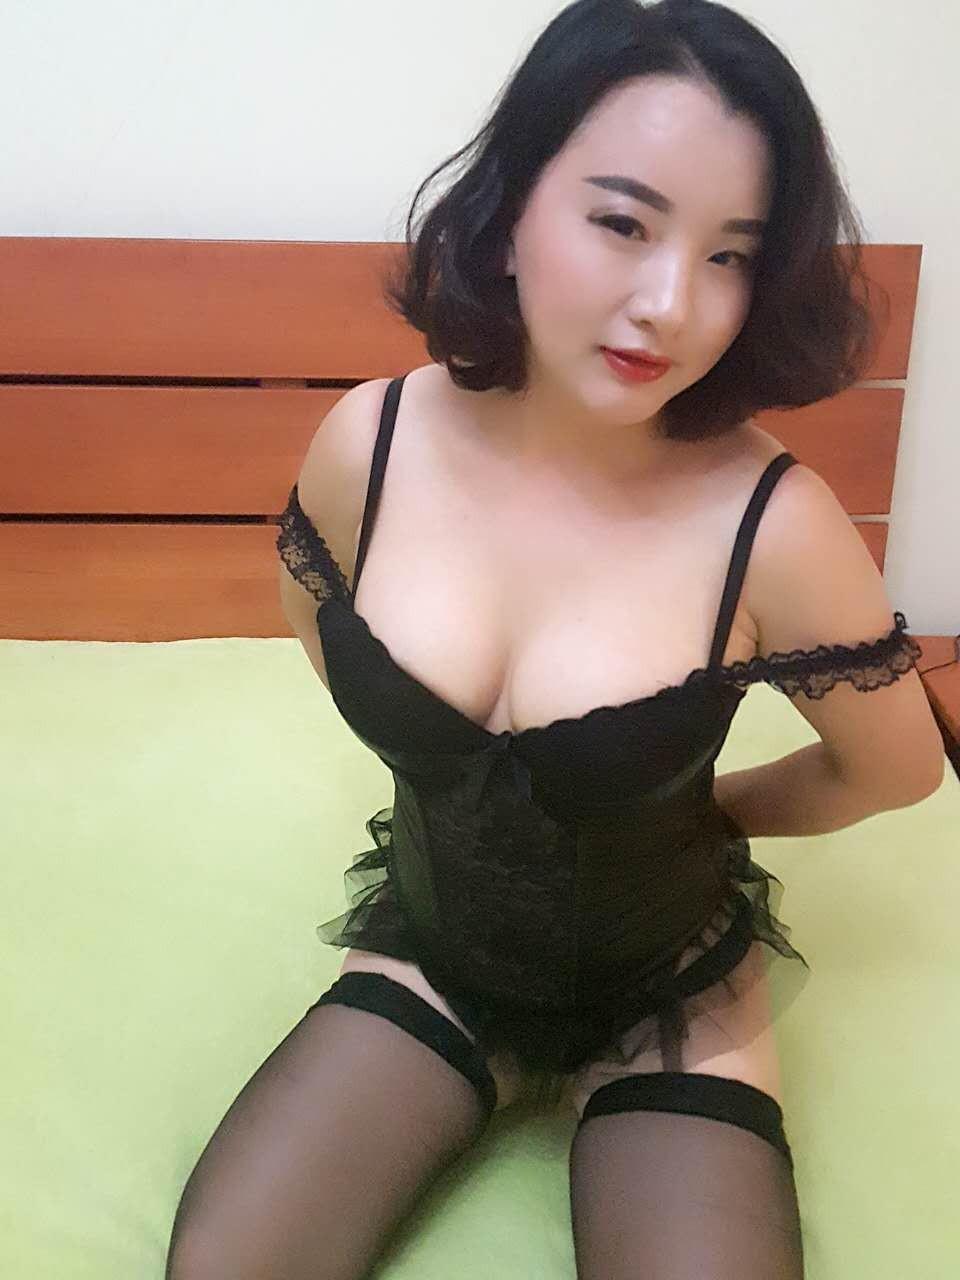 thai nuru massage striptease oulu